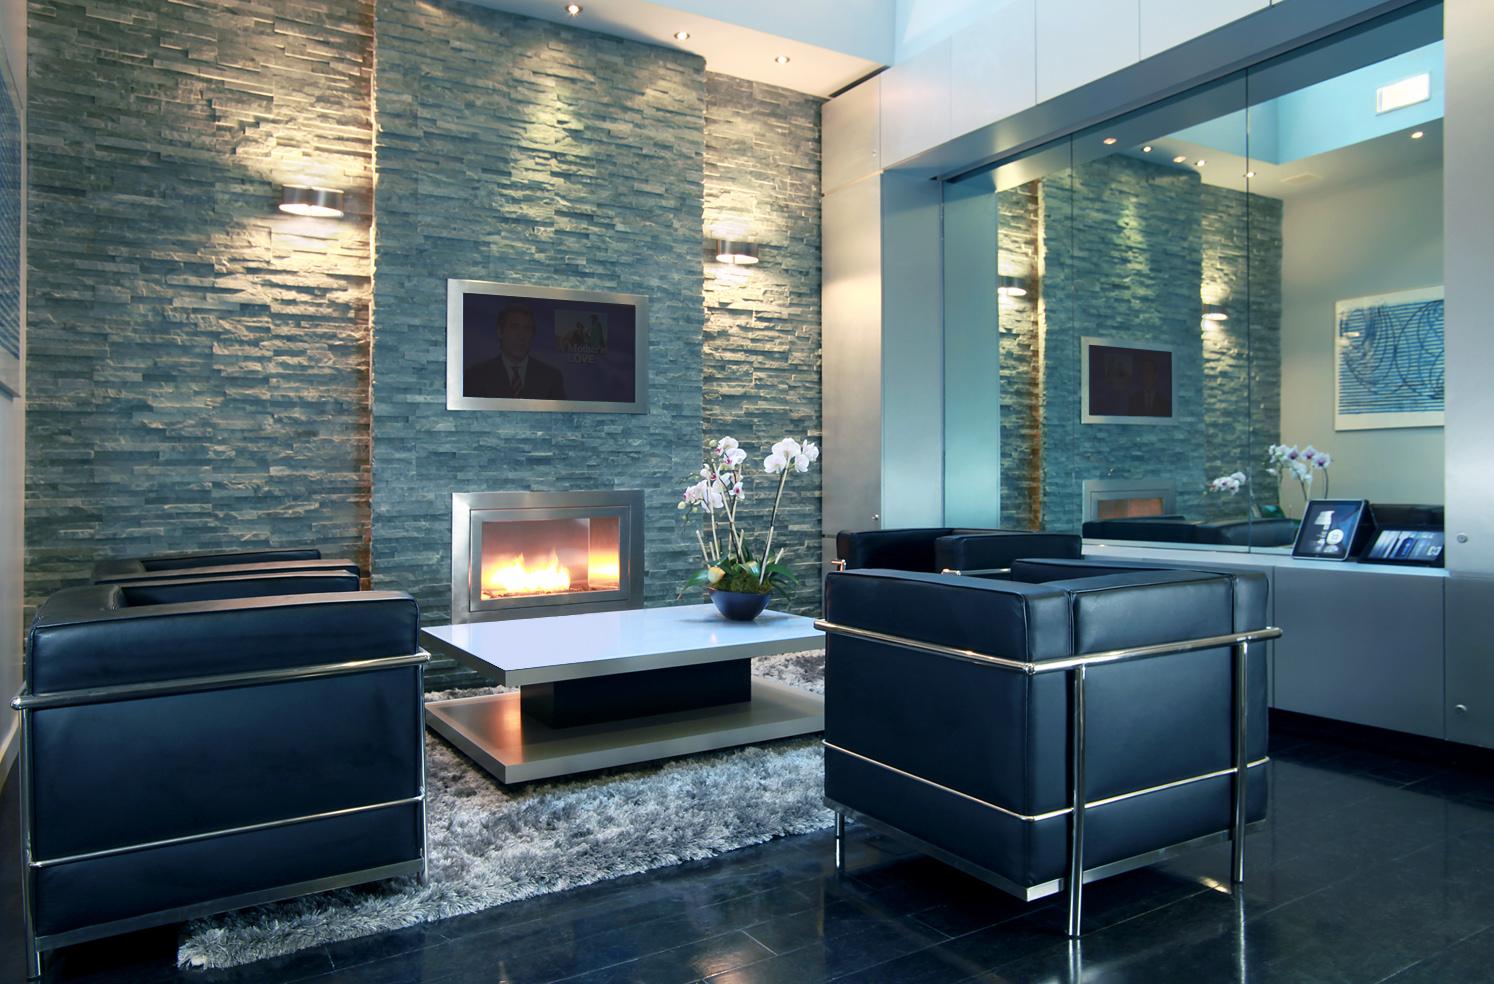 Residential custom fireplaces